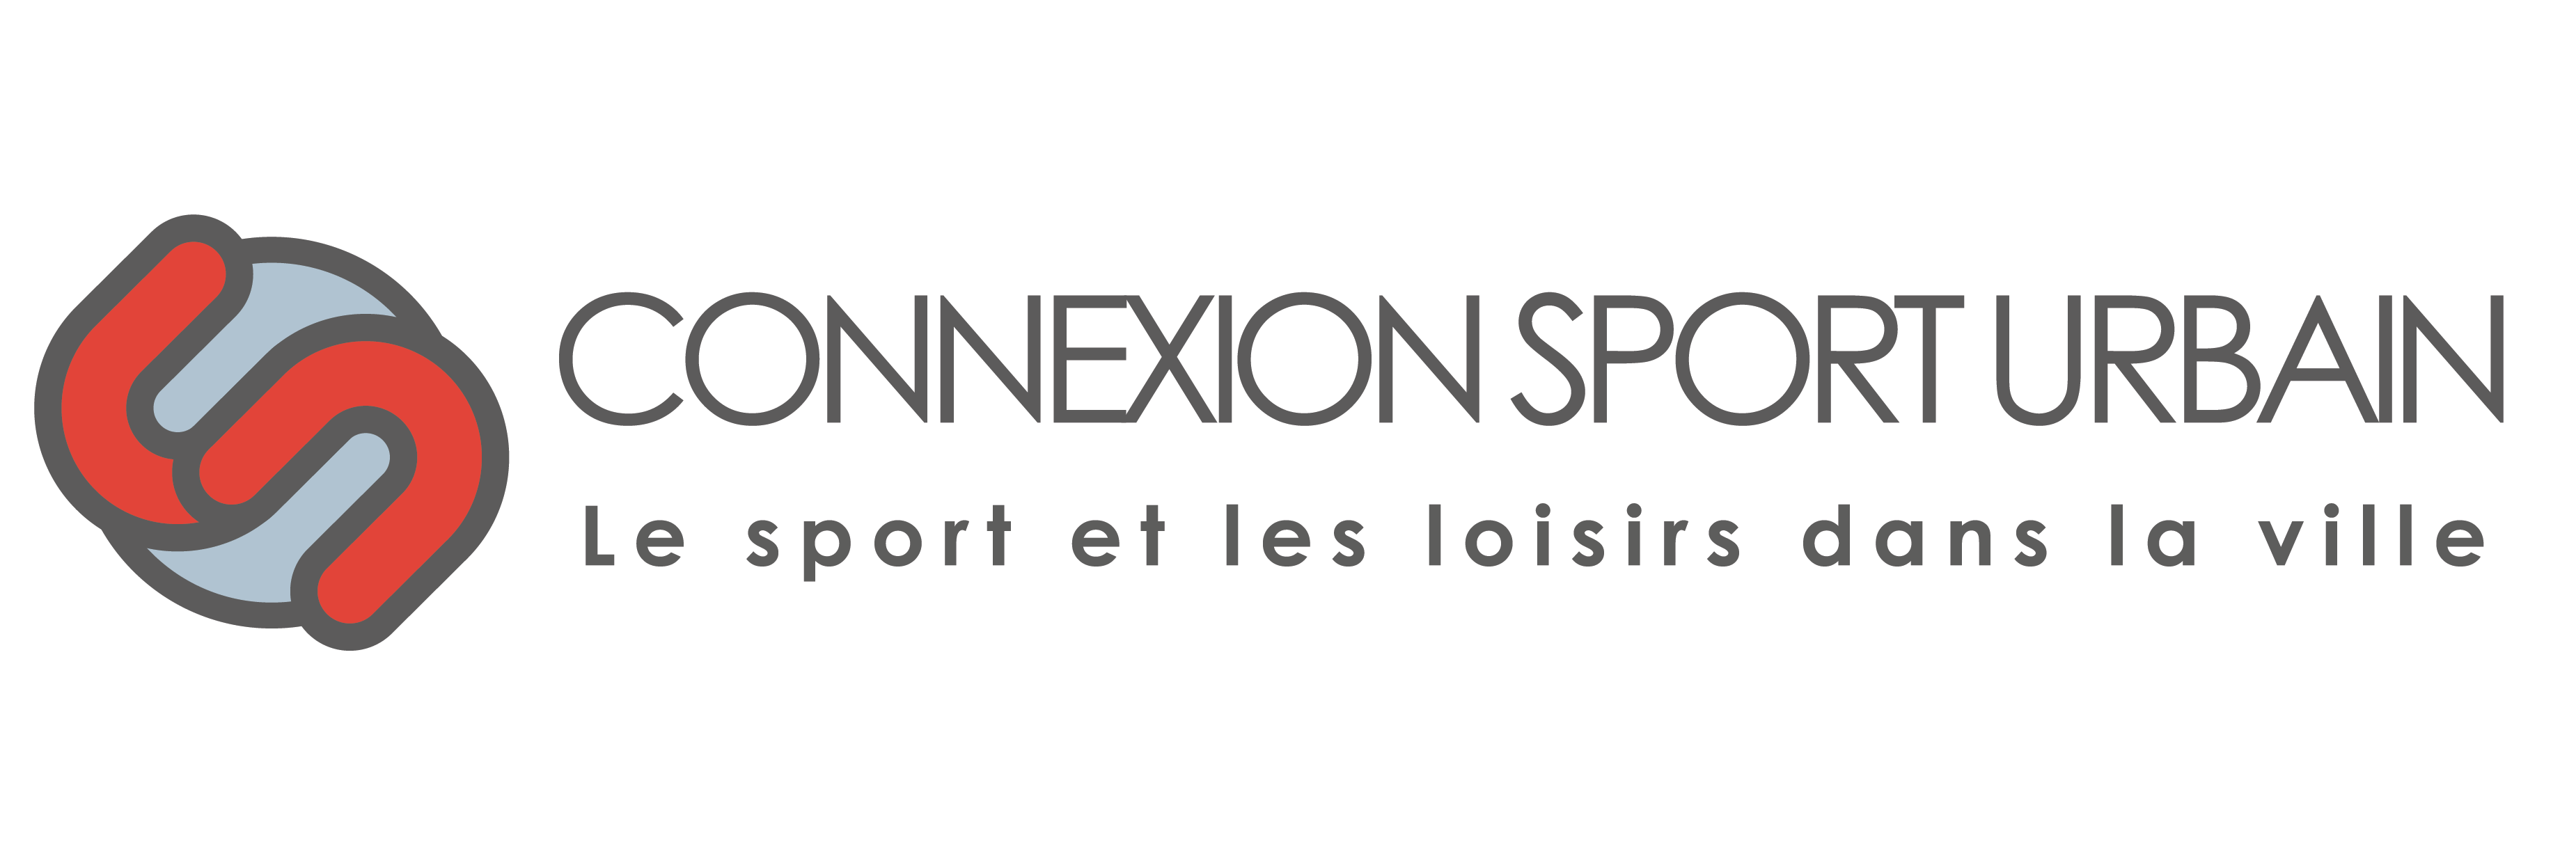 Logo Connexion Sport Urbain